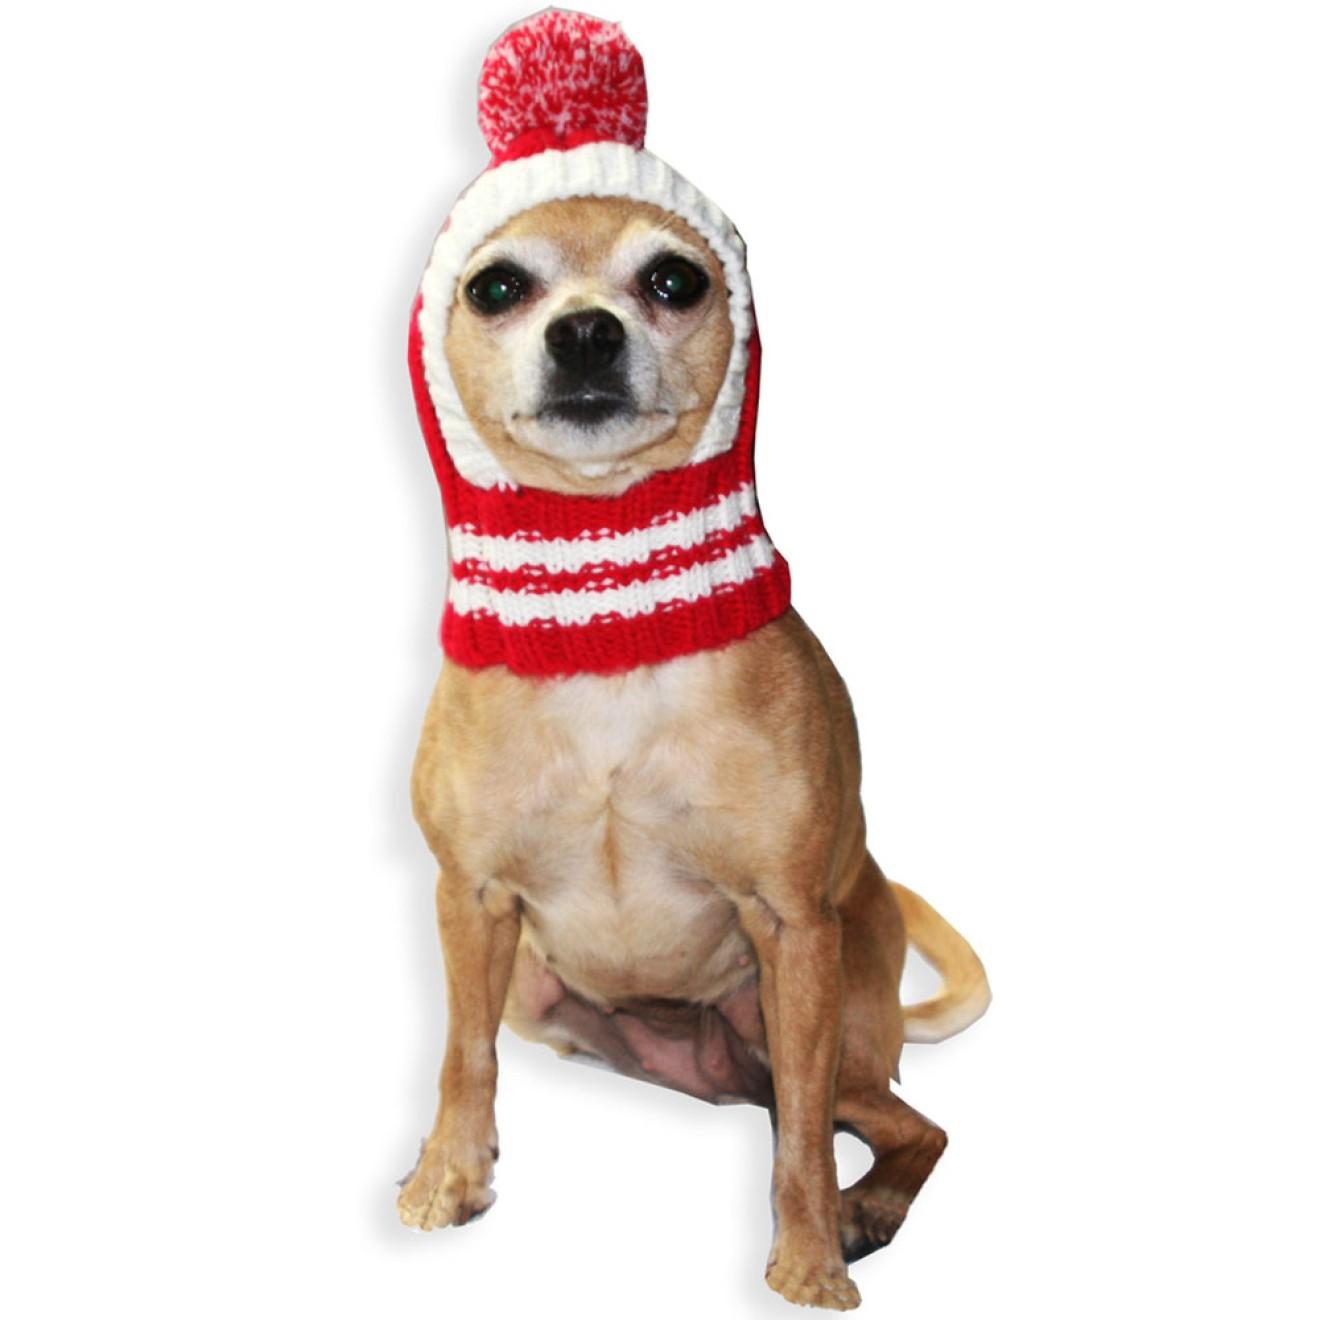 Hunde-Bandanas, Hundehalstuch, Hunde-Schal, Hundemütze, Hunde-Cap